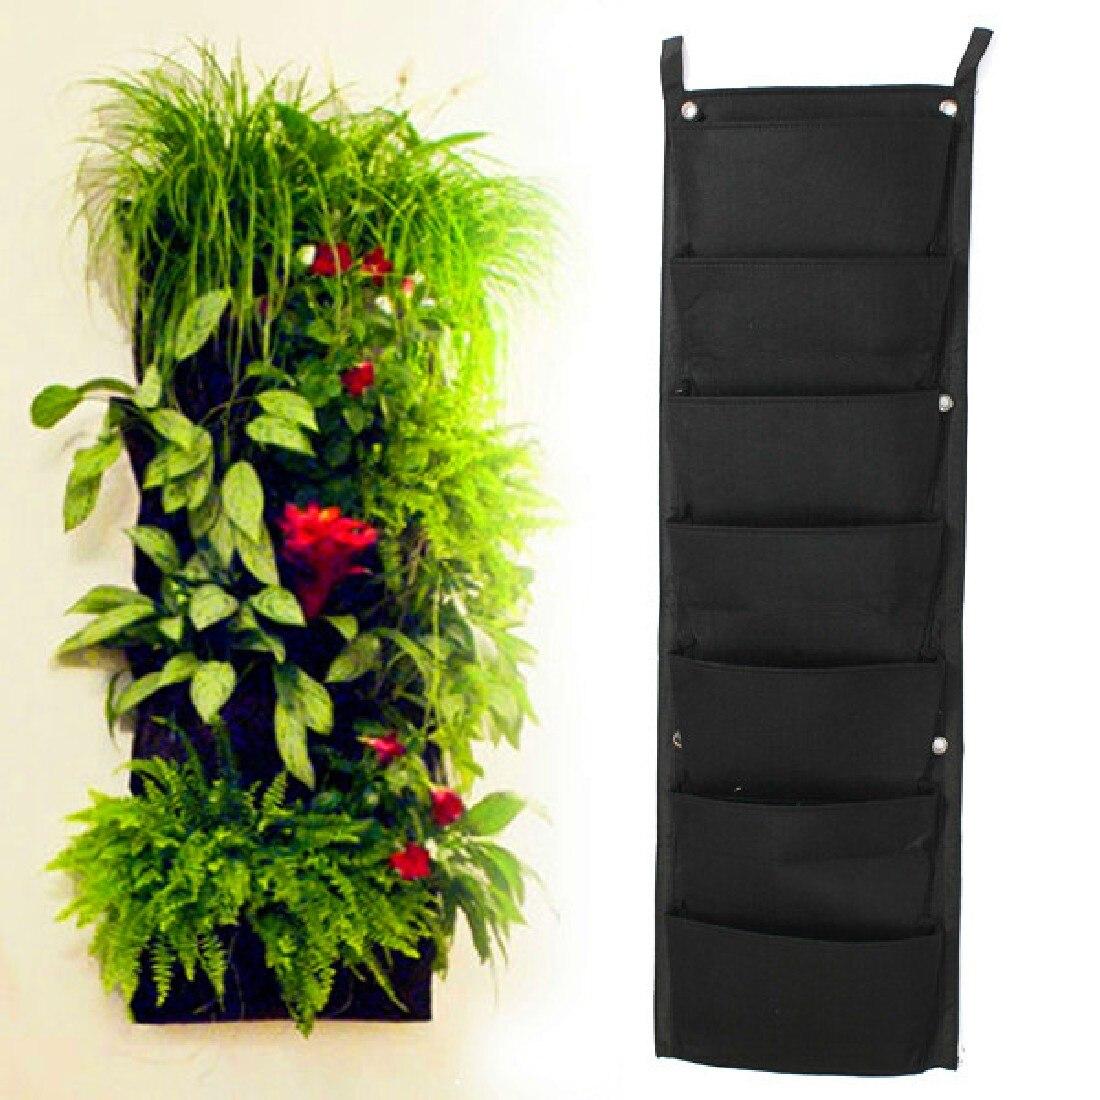 7-Pocket NEW Felt 1PC Outdoor Vertical Gardening Flower Pots and Planter Hanging Pots Planter On wall Green Field